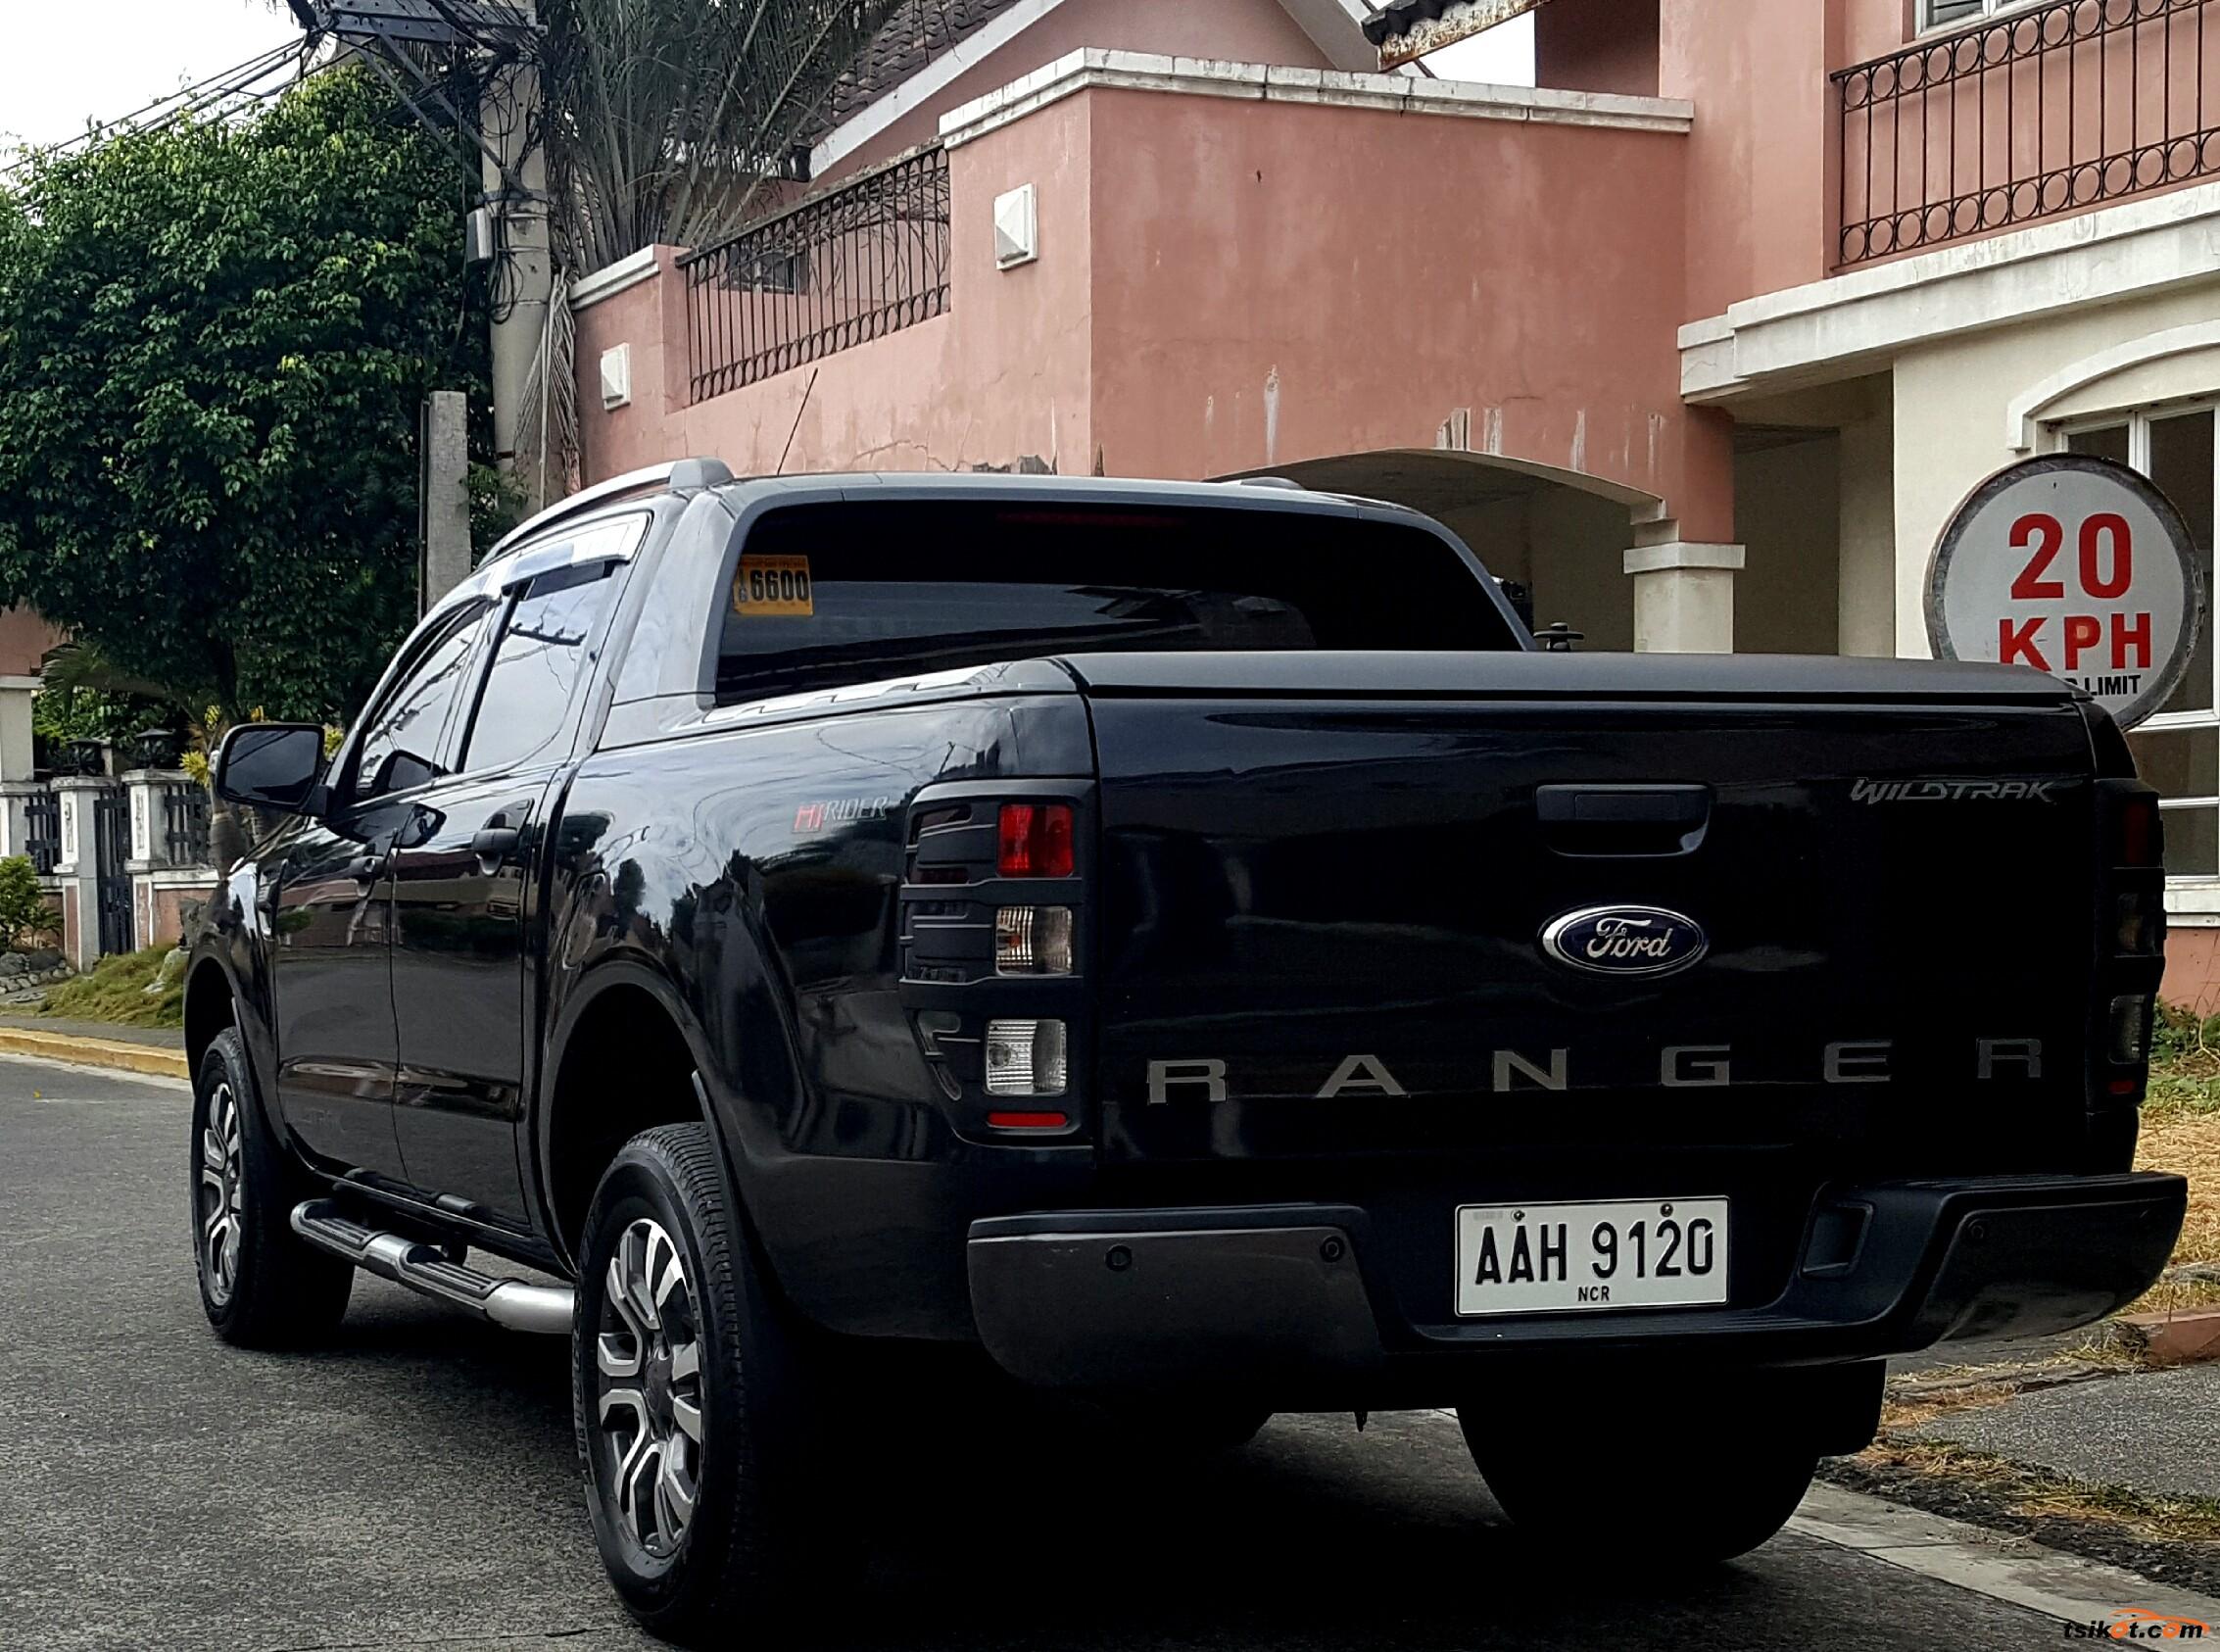 Ford Ranger 2 3 L Engine For Sale >> Ford Ranger 2014 - Car for Sale Calabarzon